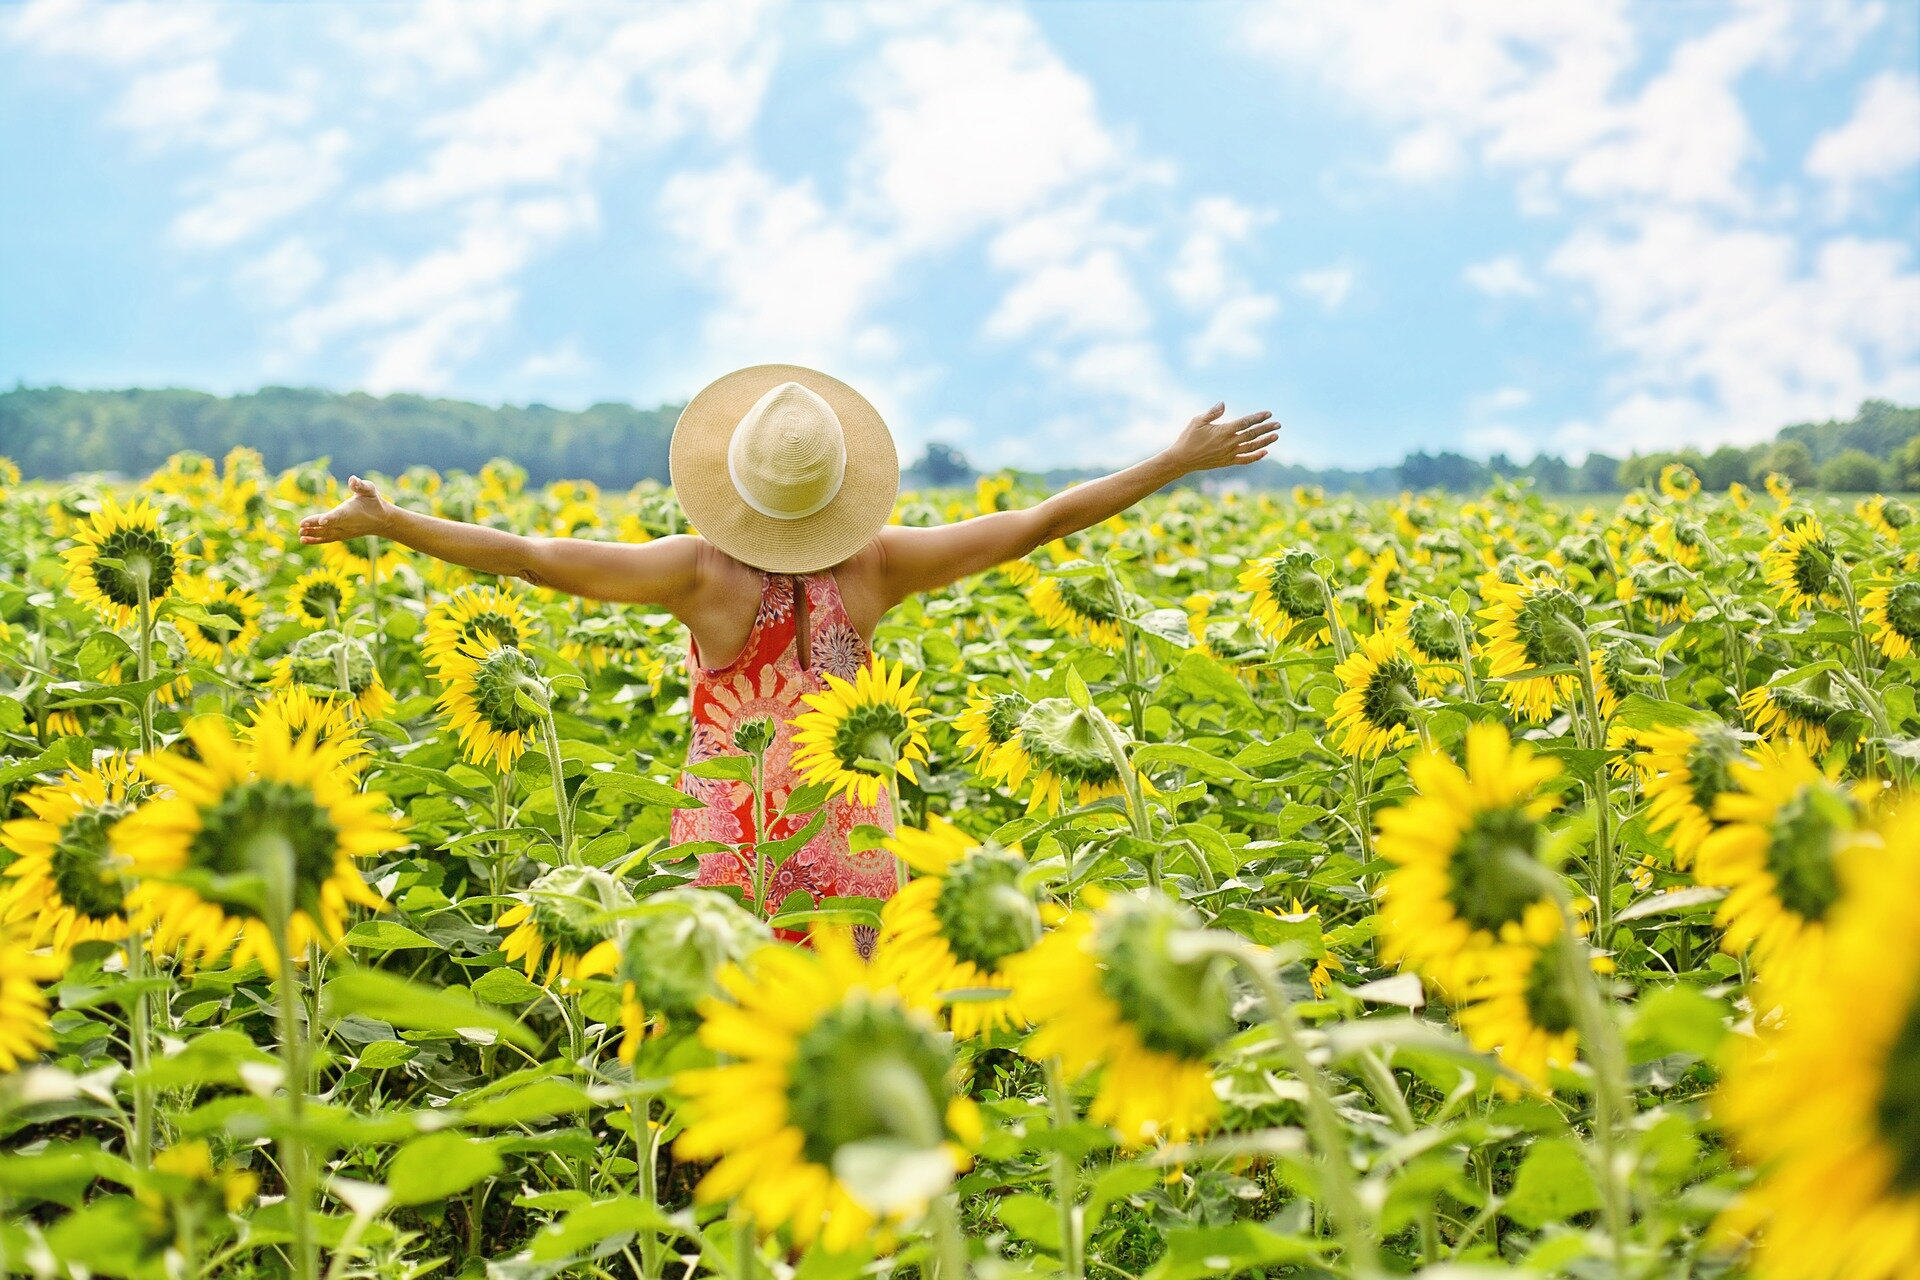 sunflowers-3640938_1920.jpg